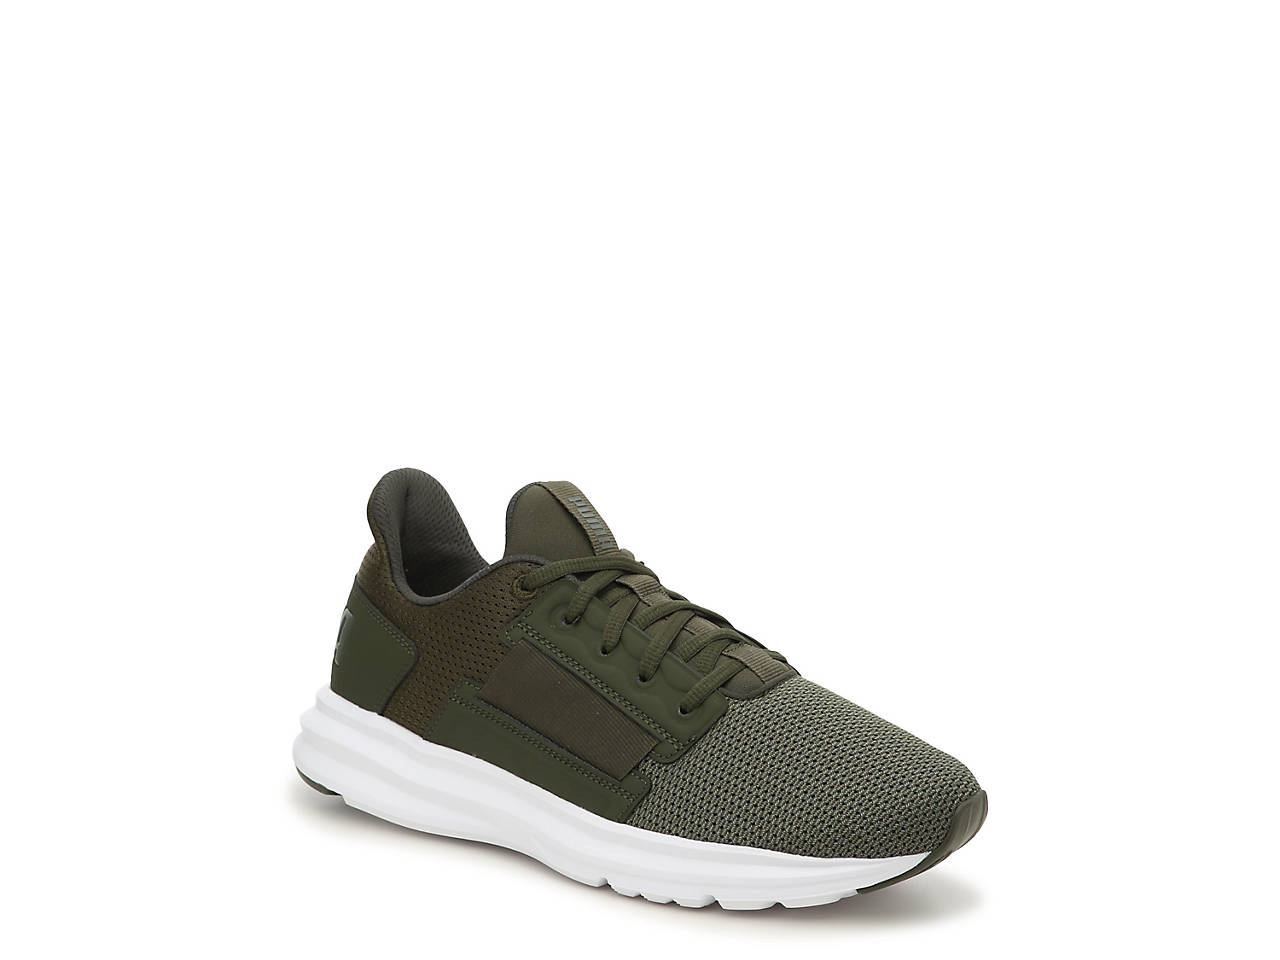 7ef363b1e076 Puma Enzo Street Jr Youth Sneaker Kids Shoes